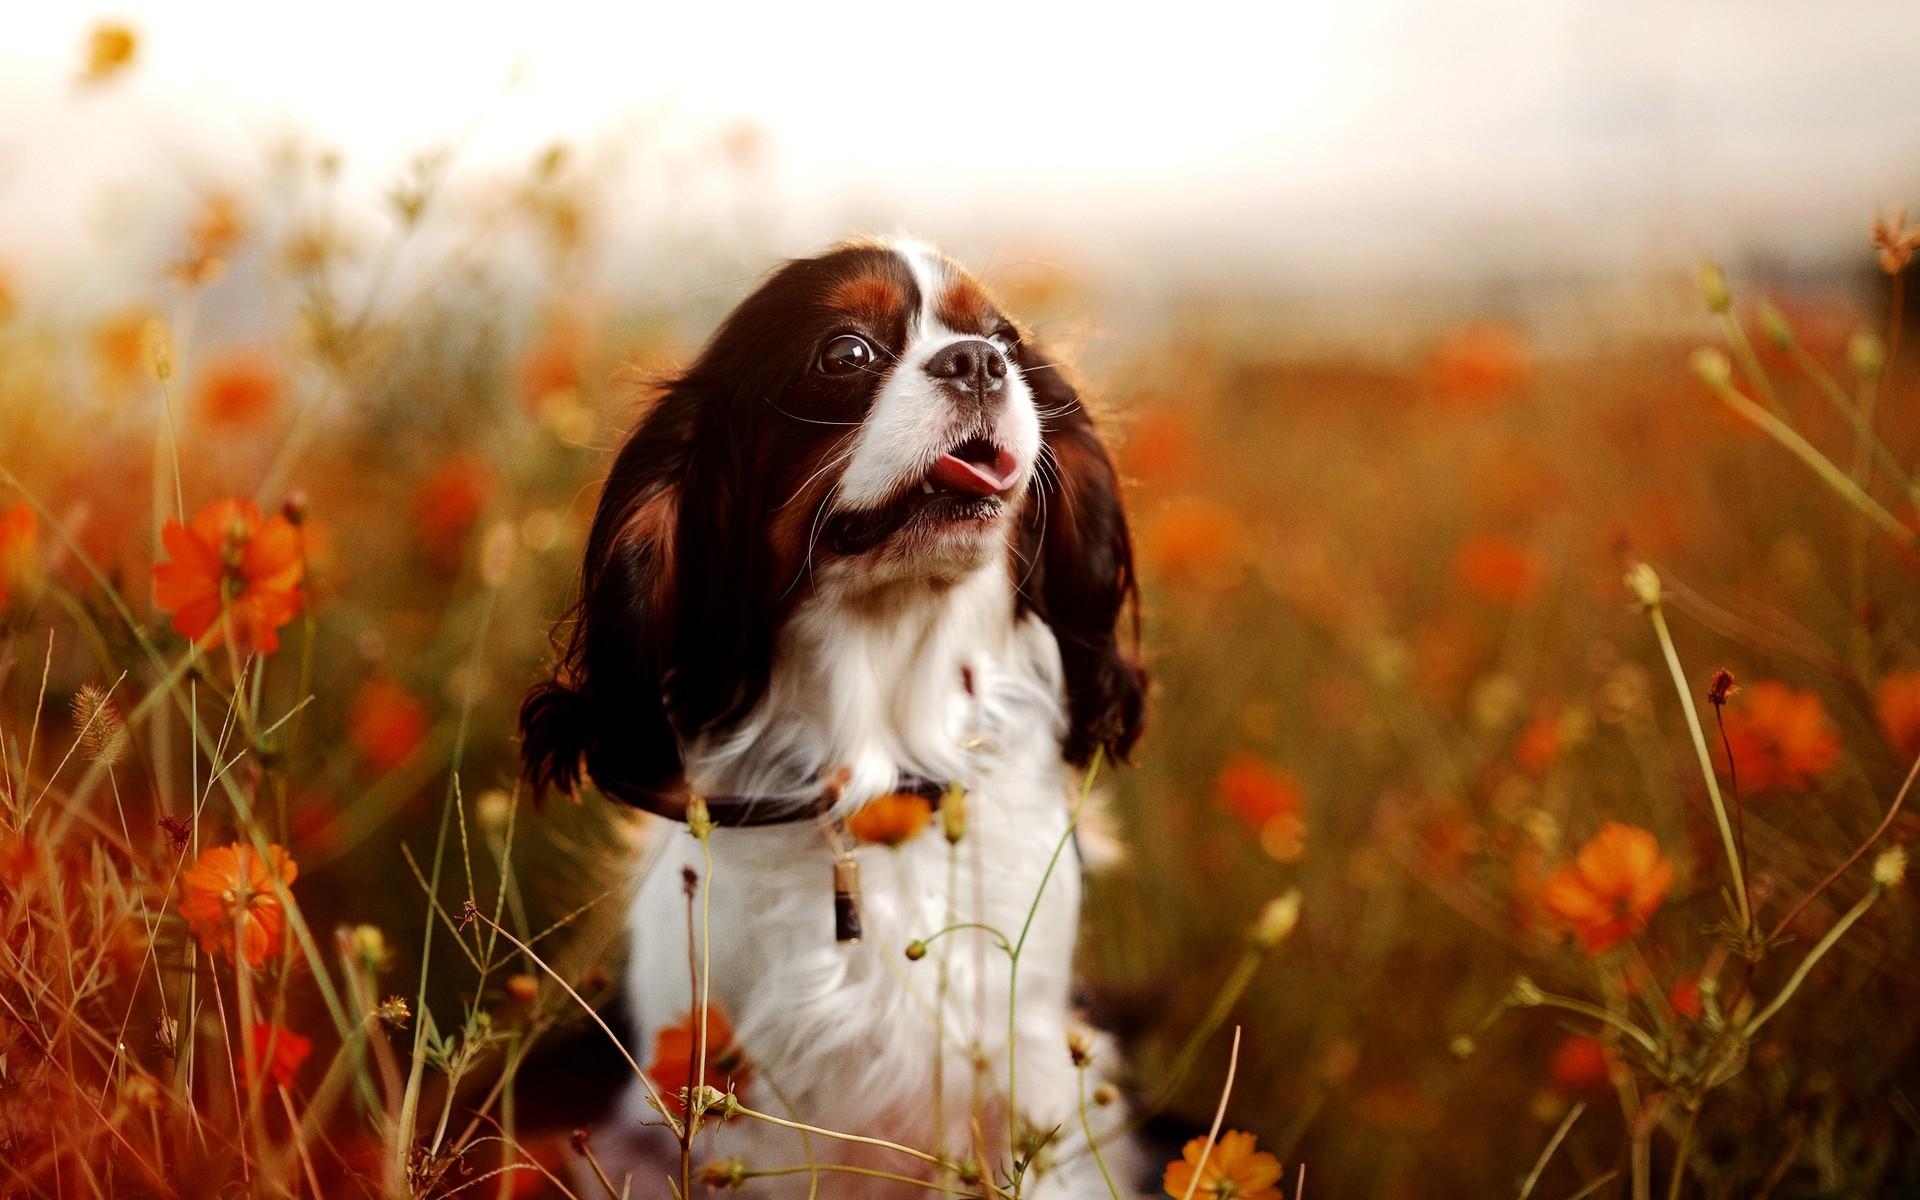 Free Dog Screensaver And Wallpaper : Free Dog Screensaver and Wallpaper Dog  Photography